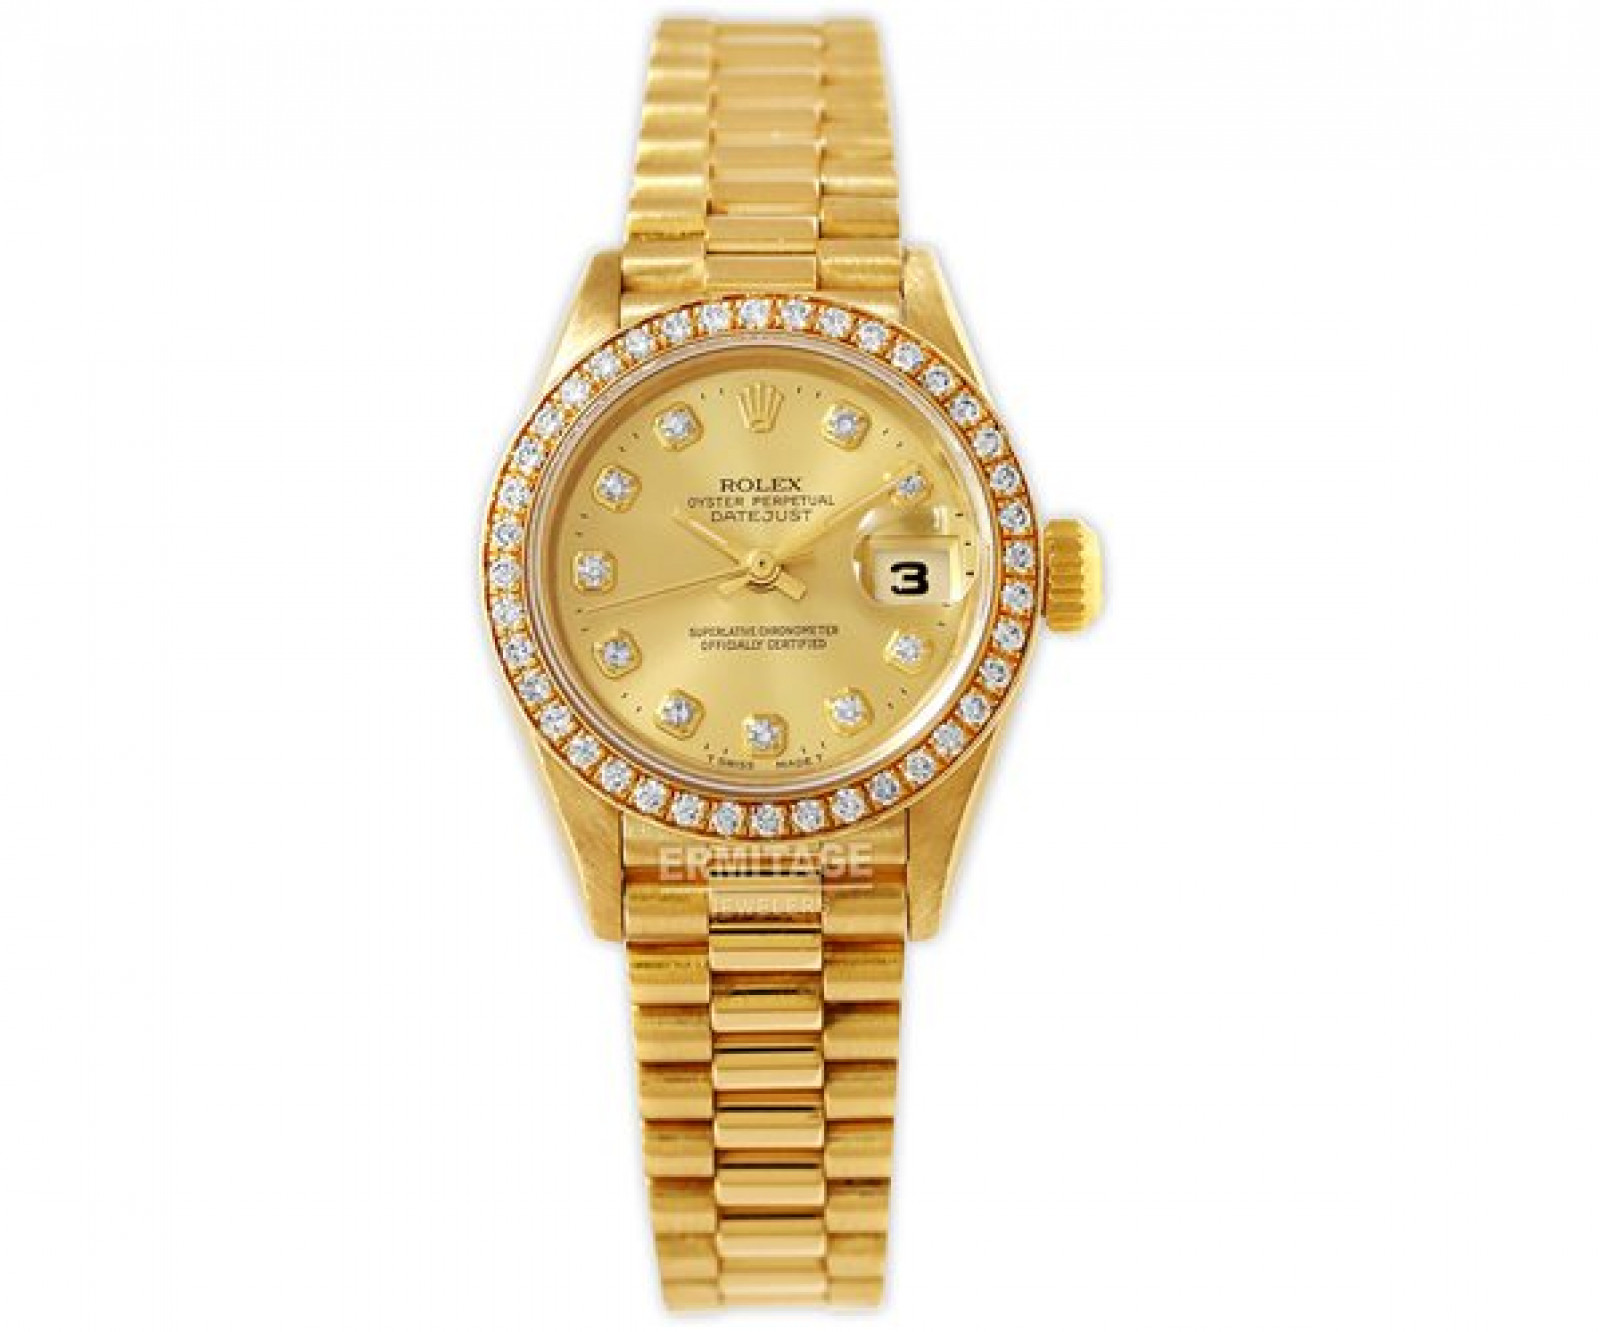 Dimaond Rolex Datejust Ref. 69138